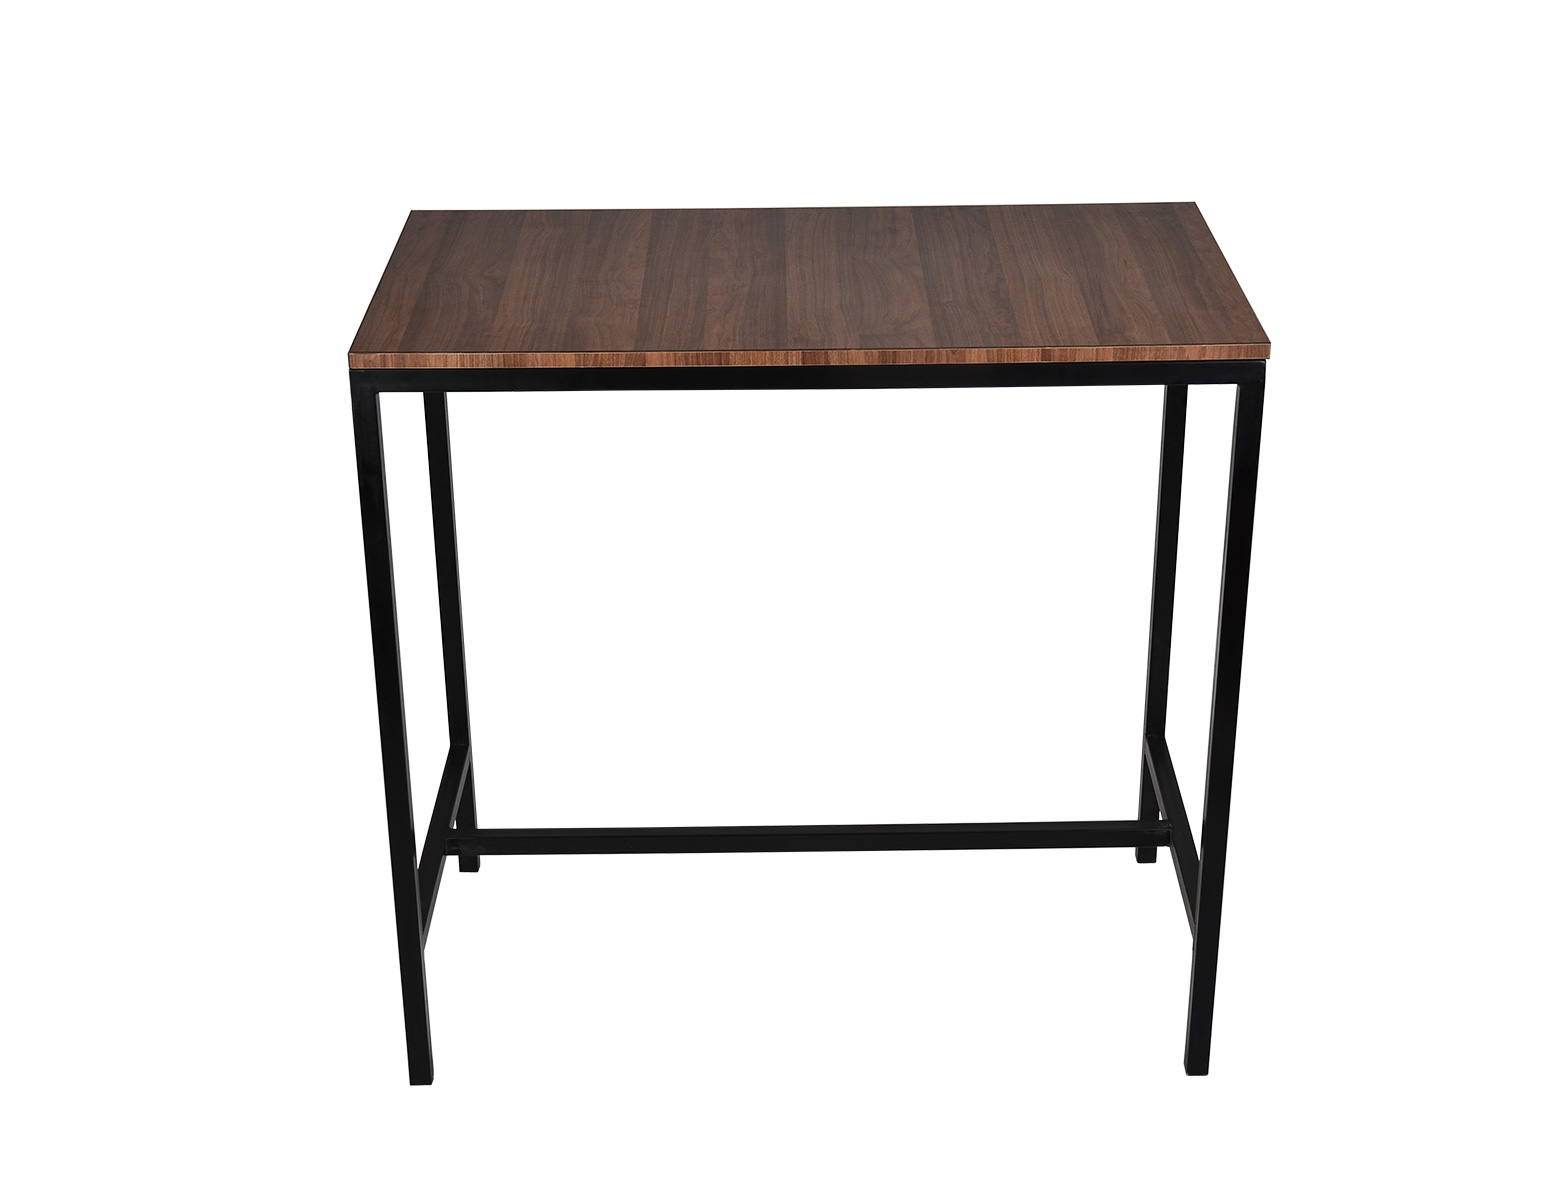 table exterieur haute table haute dazzio en alu bross inoxydable avec 4 chaises destockage. Black Bedroom Furniture Sets. Home Design Ideas